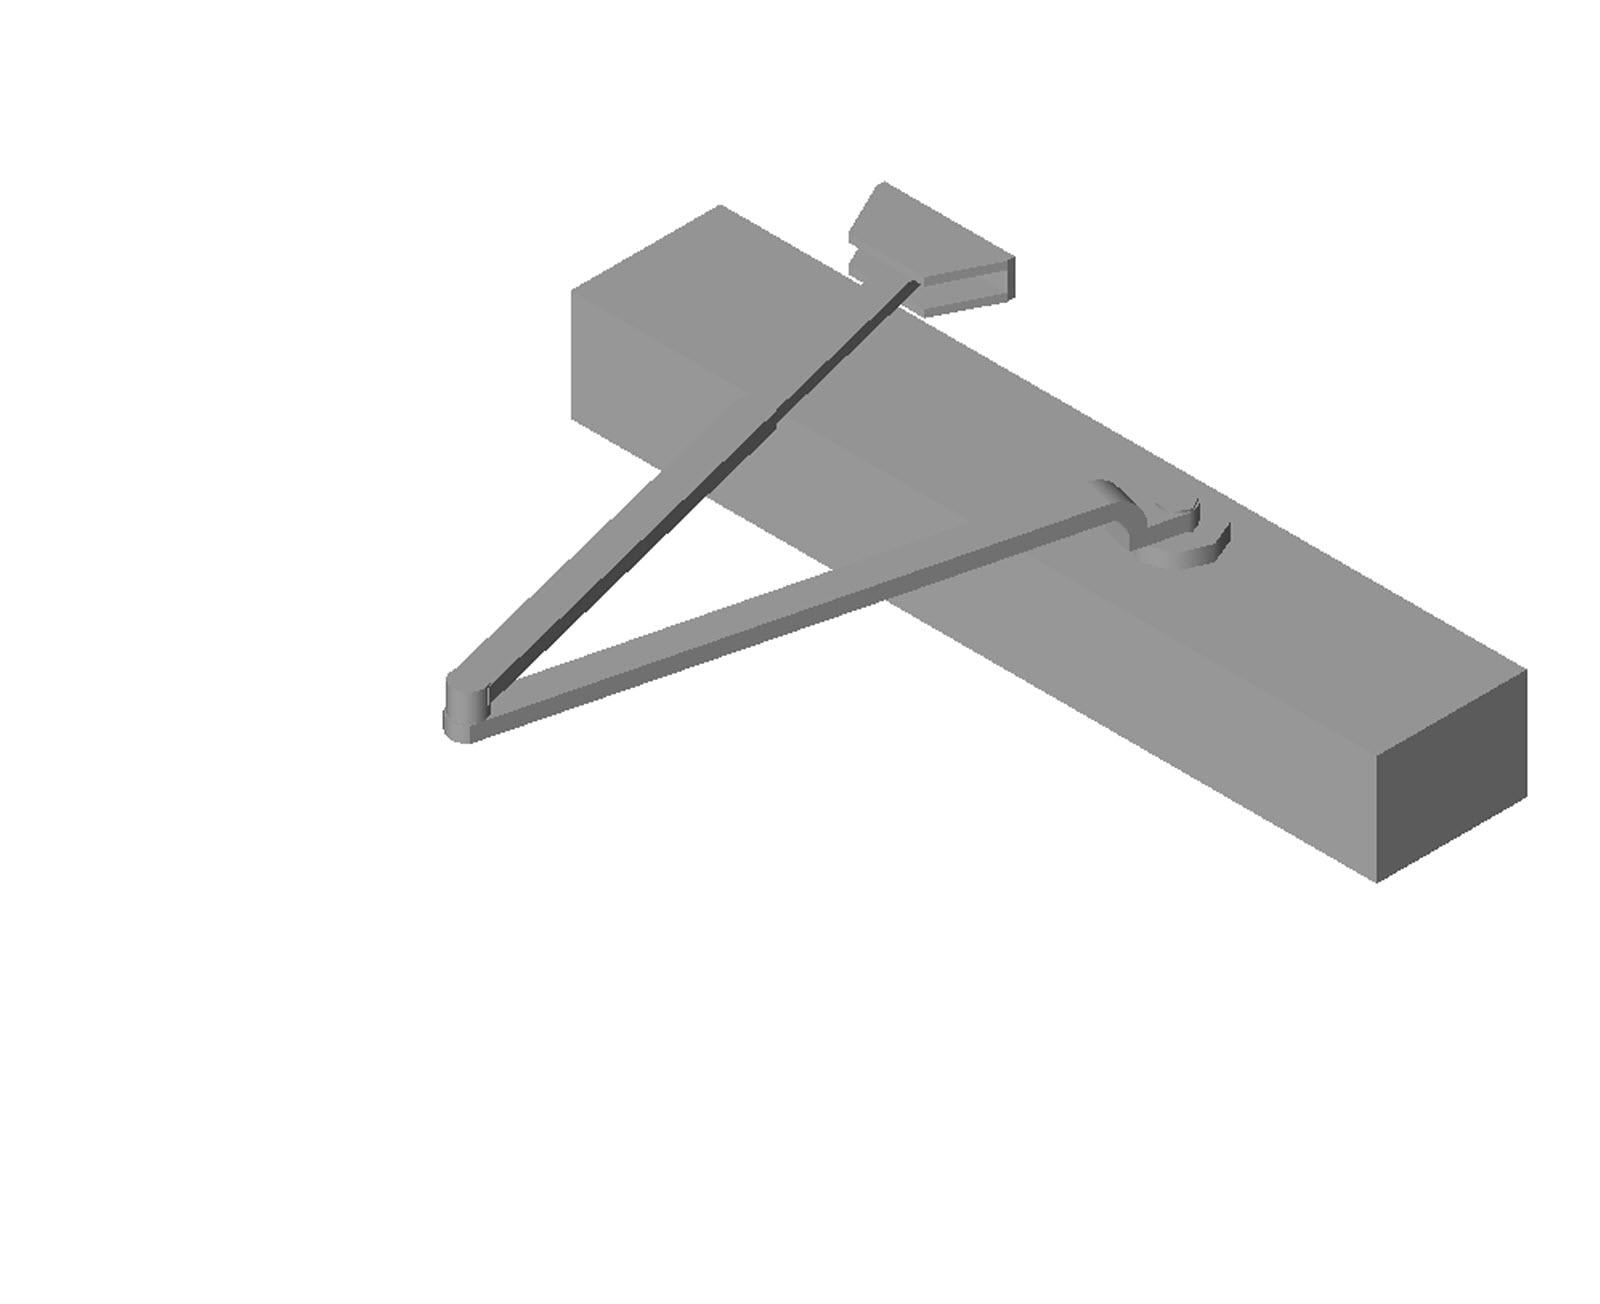 Doors and Hardware Door Hardware Door Controls PDQ - 5300 - Series  sc 1 st  BIM Objects / Families & BIM Objects / Families